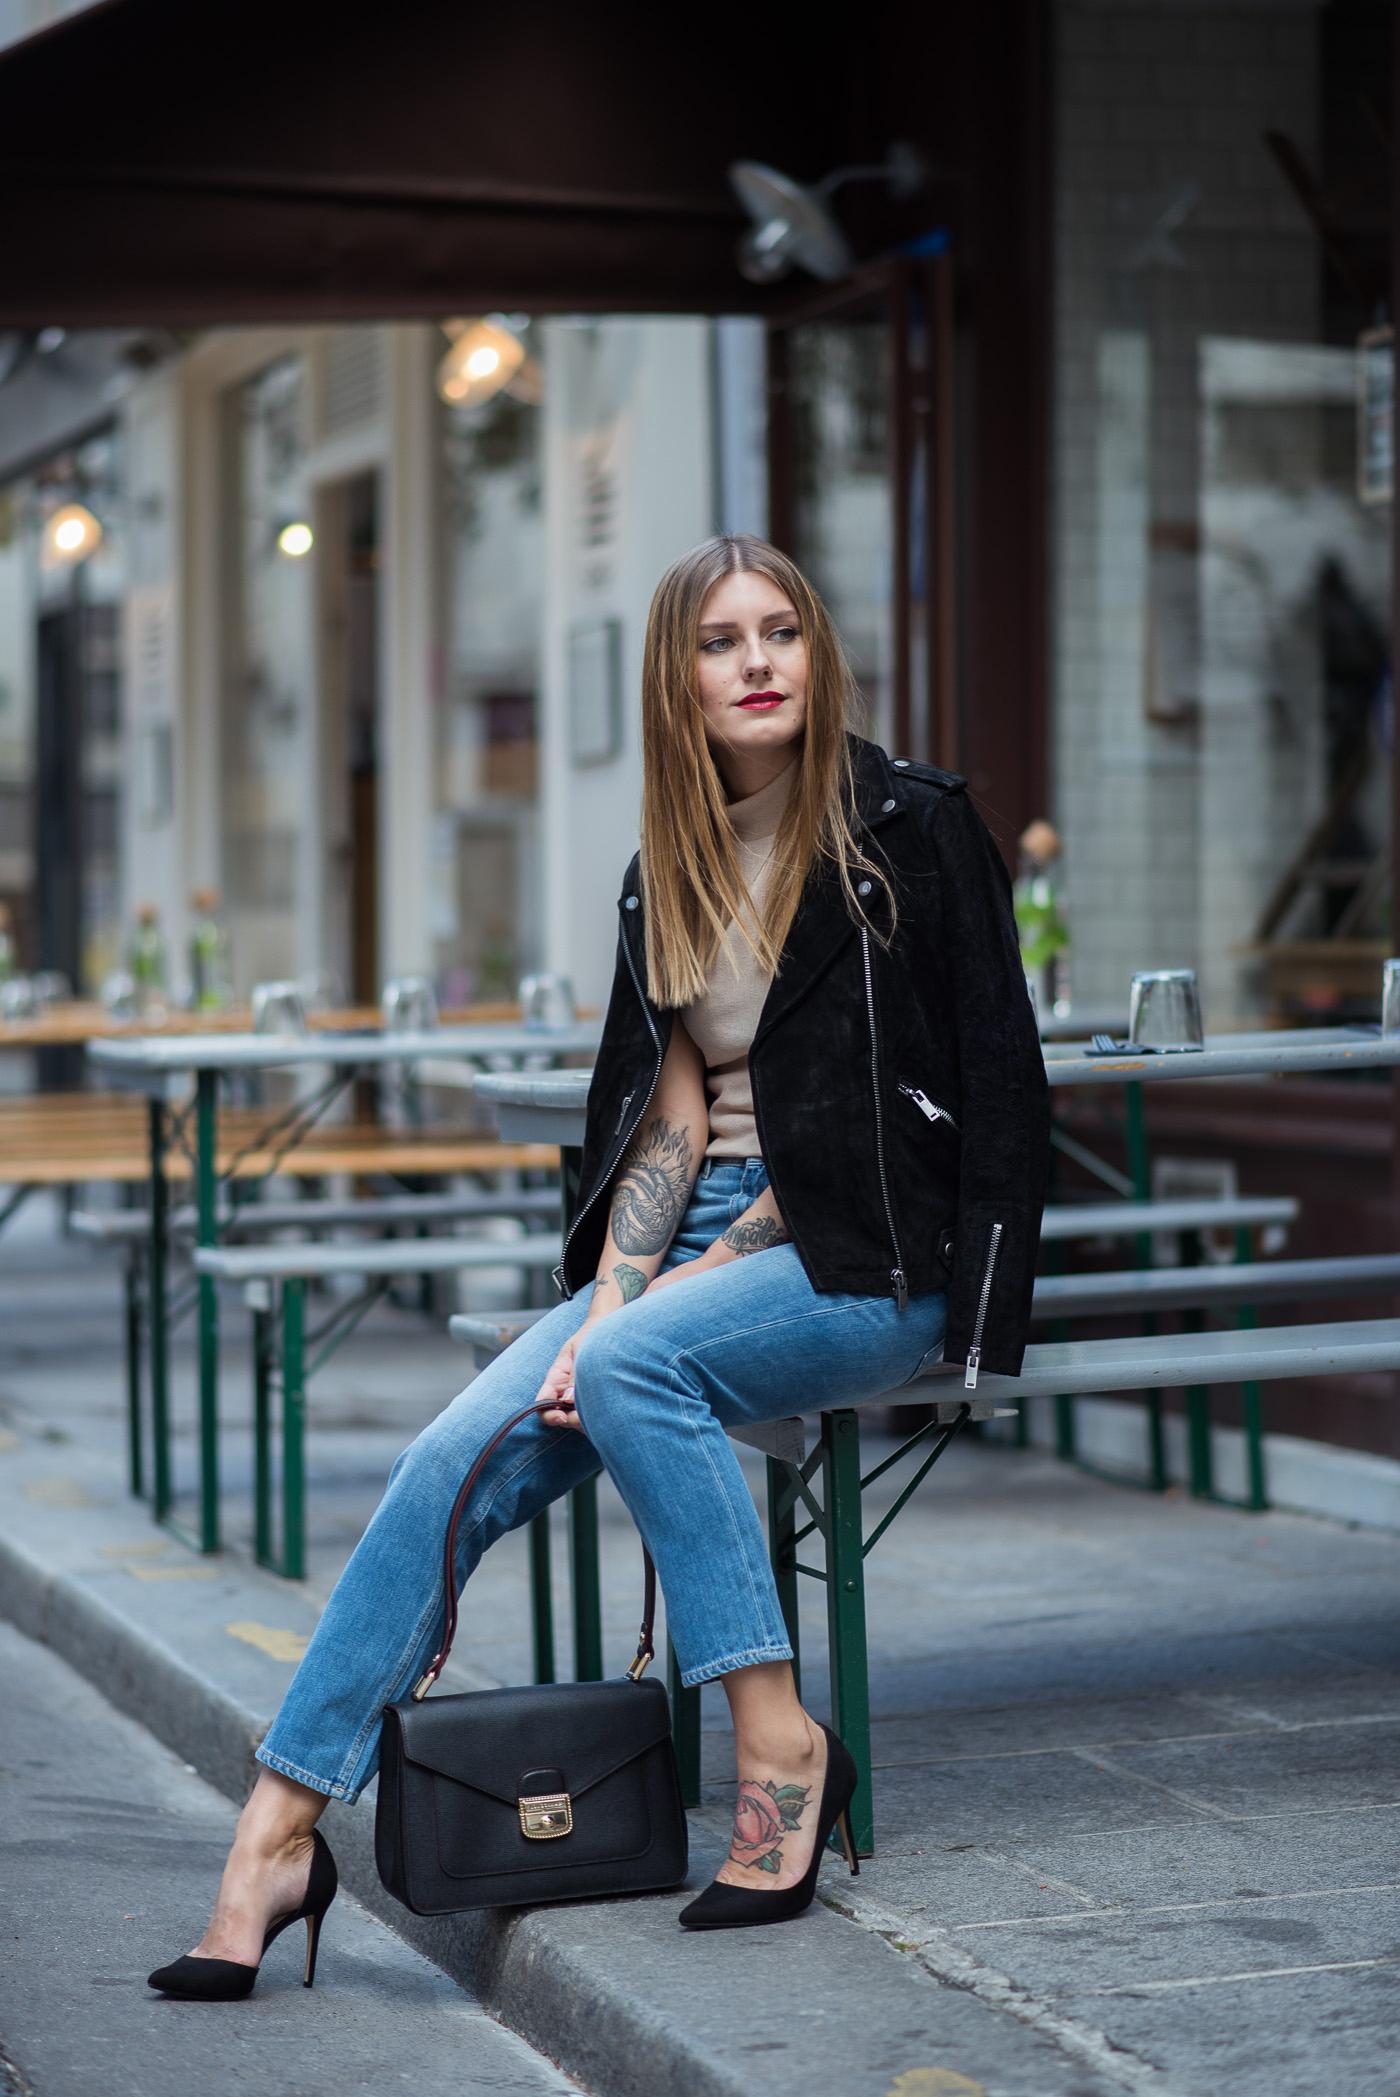 paris_fashion_week_leather_jacket_selected_femme_1